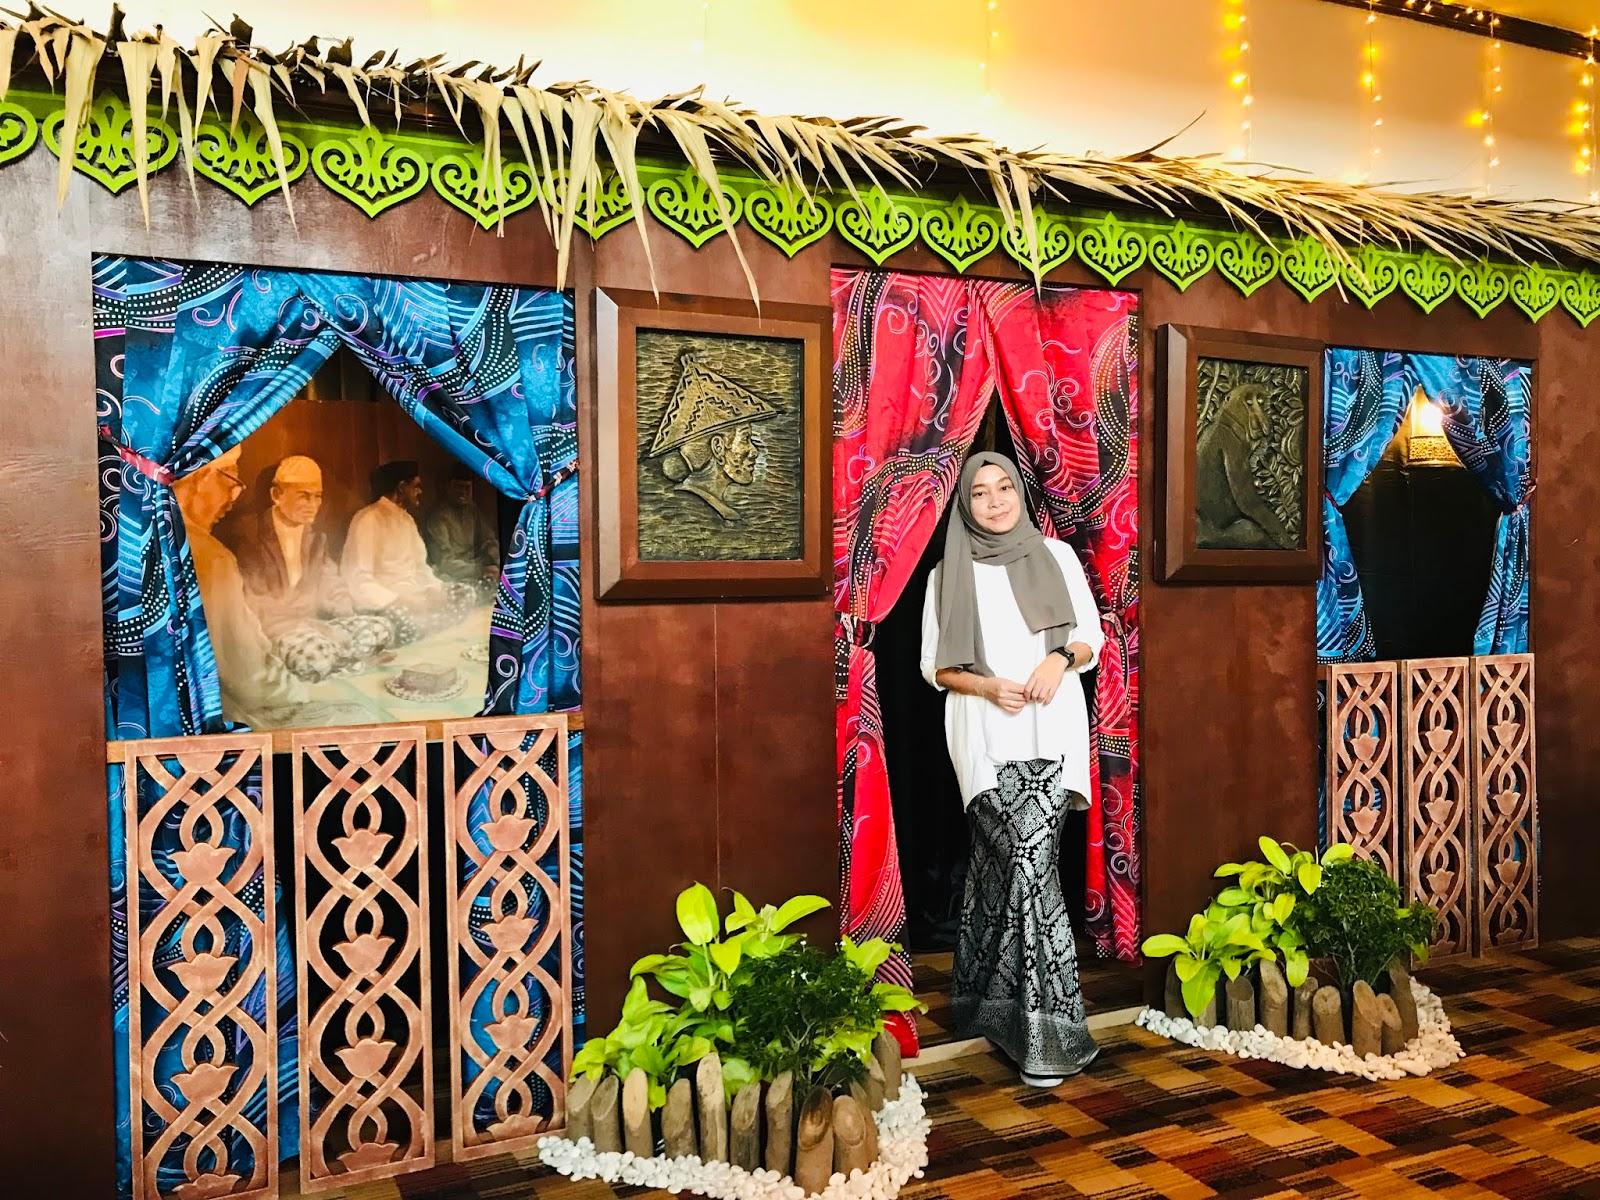 THIRD CONSECUTIVE YEARS OF BIGGEST RAMADAN BAZAAR  IN SUTERA HARBOUR RESORT, KOTA KINABALU